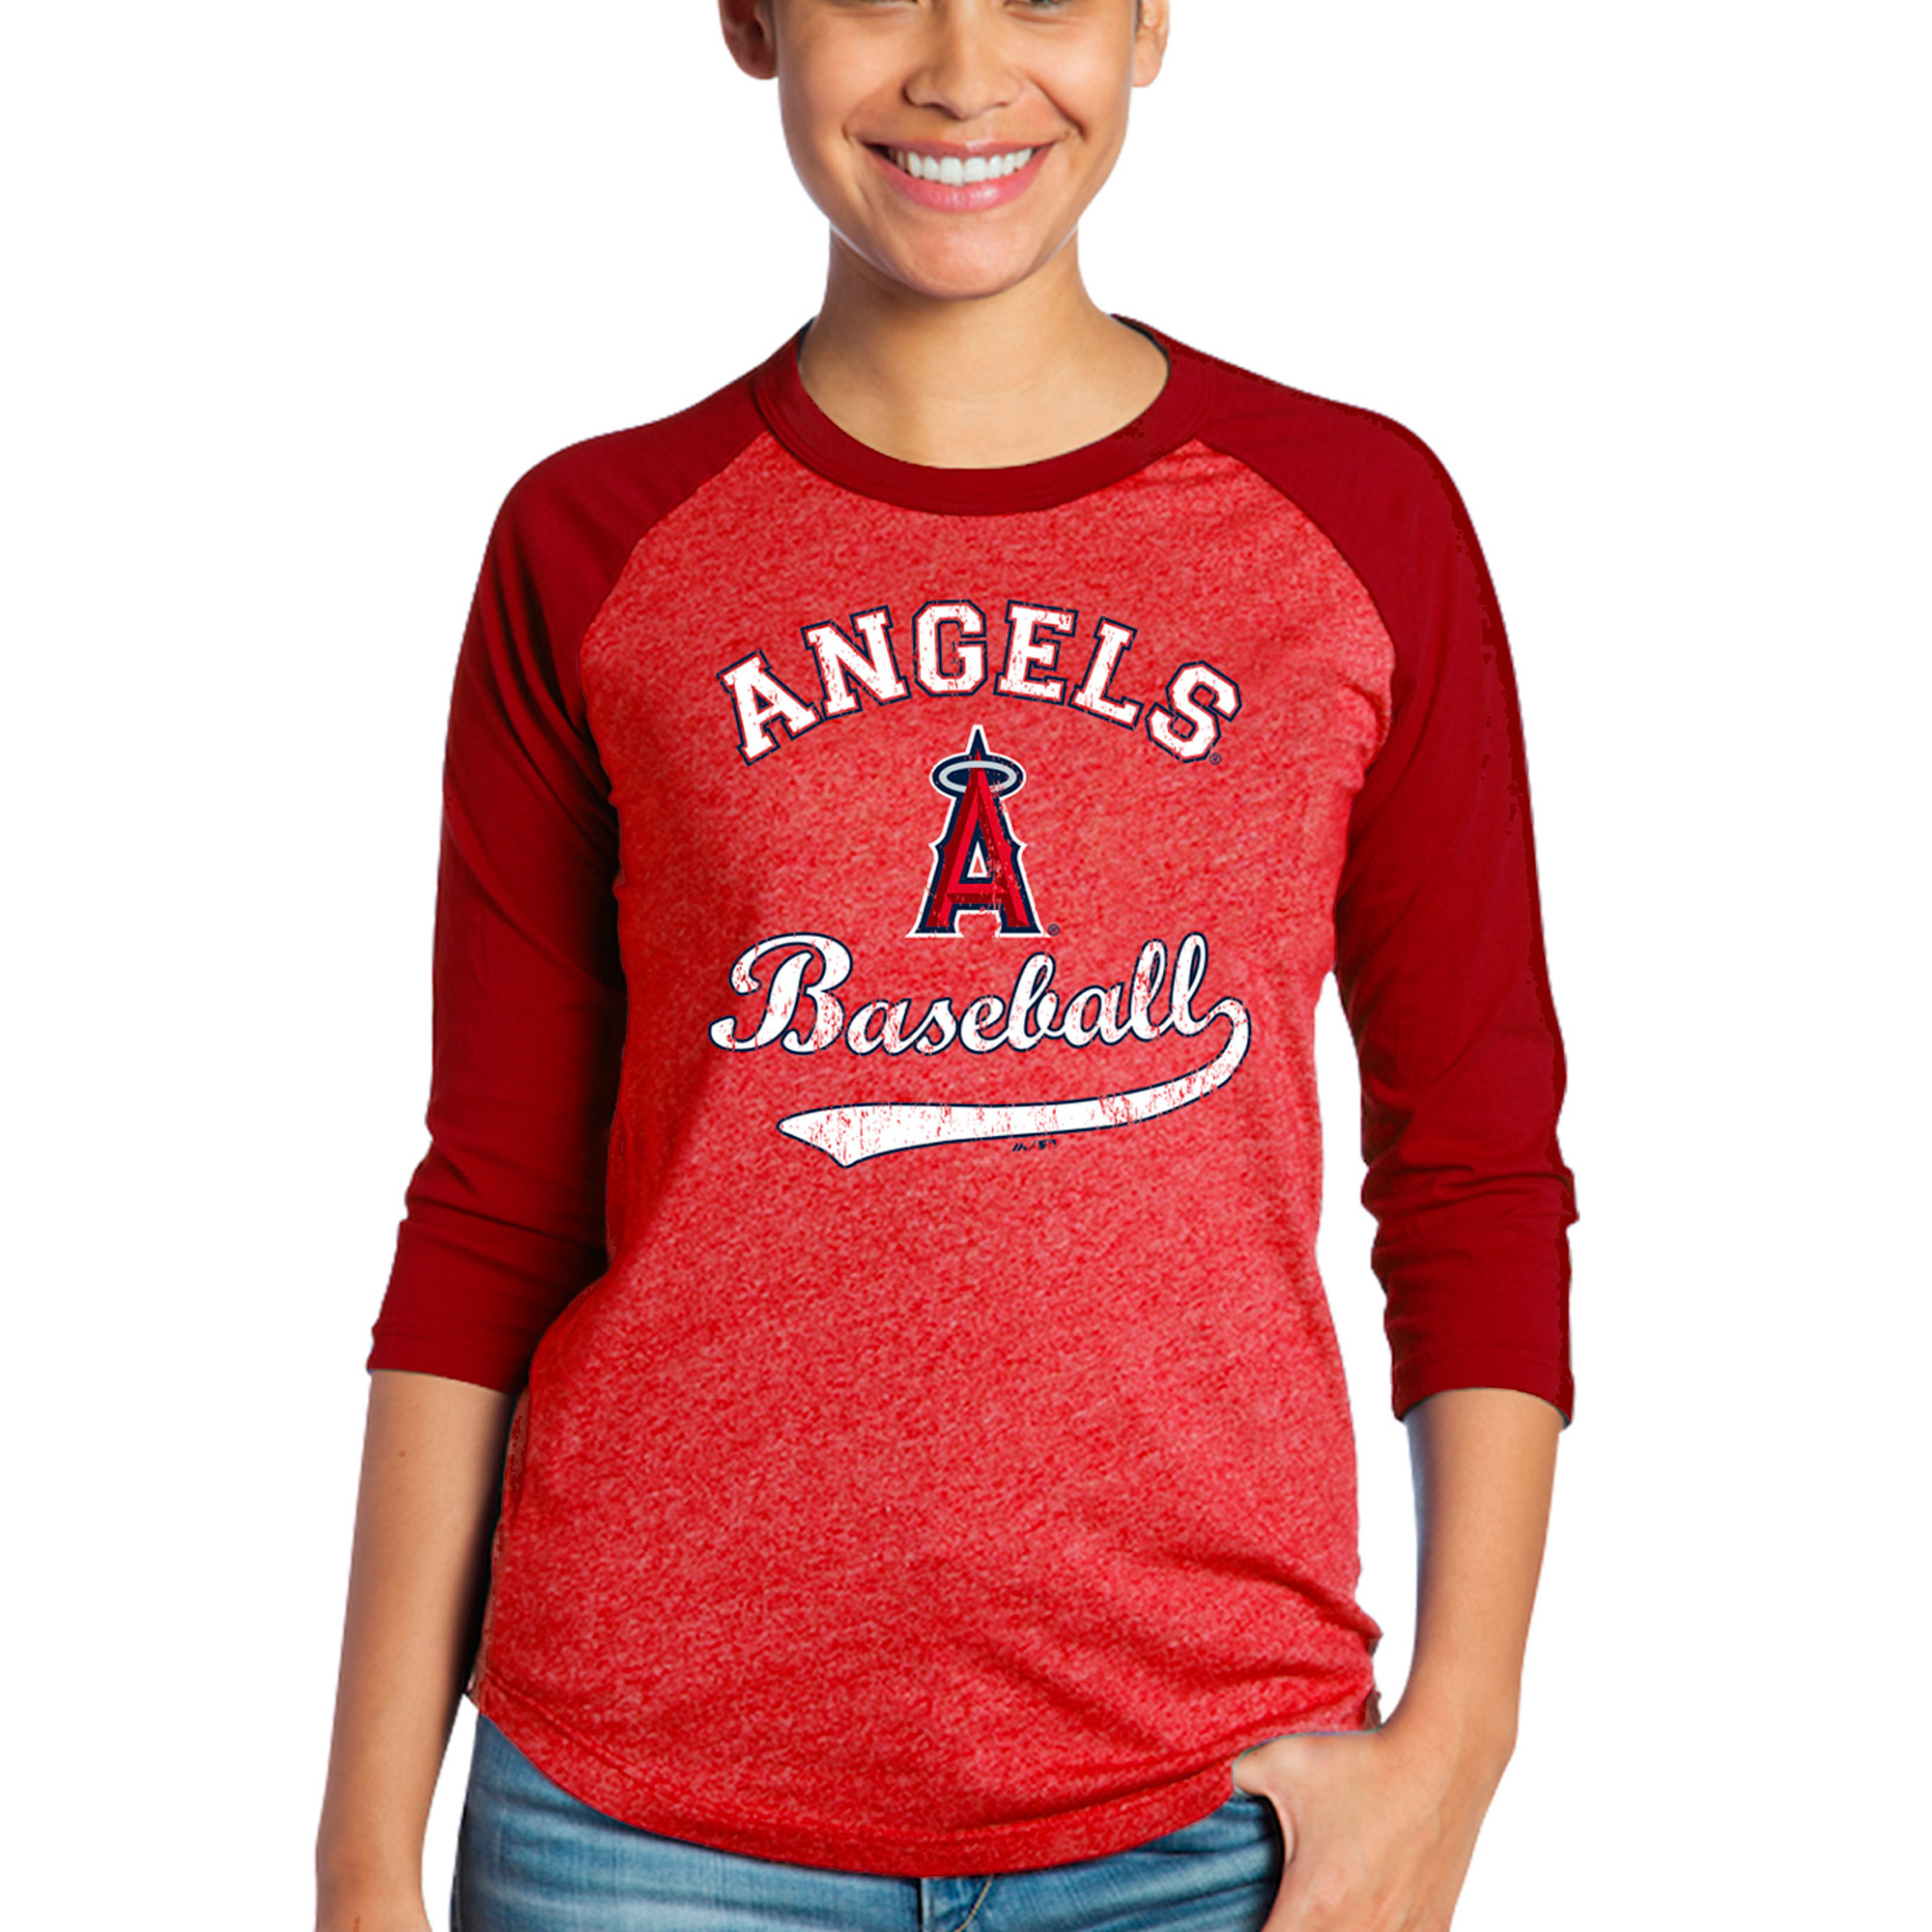 Los Angeles Angels Majestic Threads Women's Team Baseball Three-Quarter Raglan Sleeve Tri-Blend T-Shirt - Red